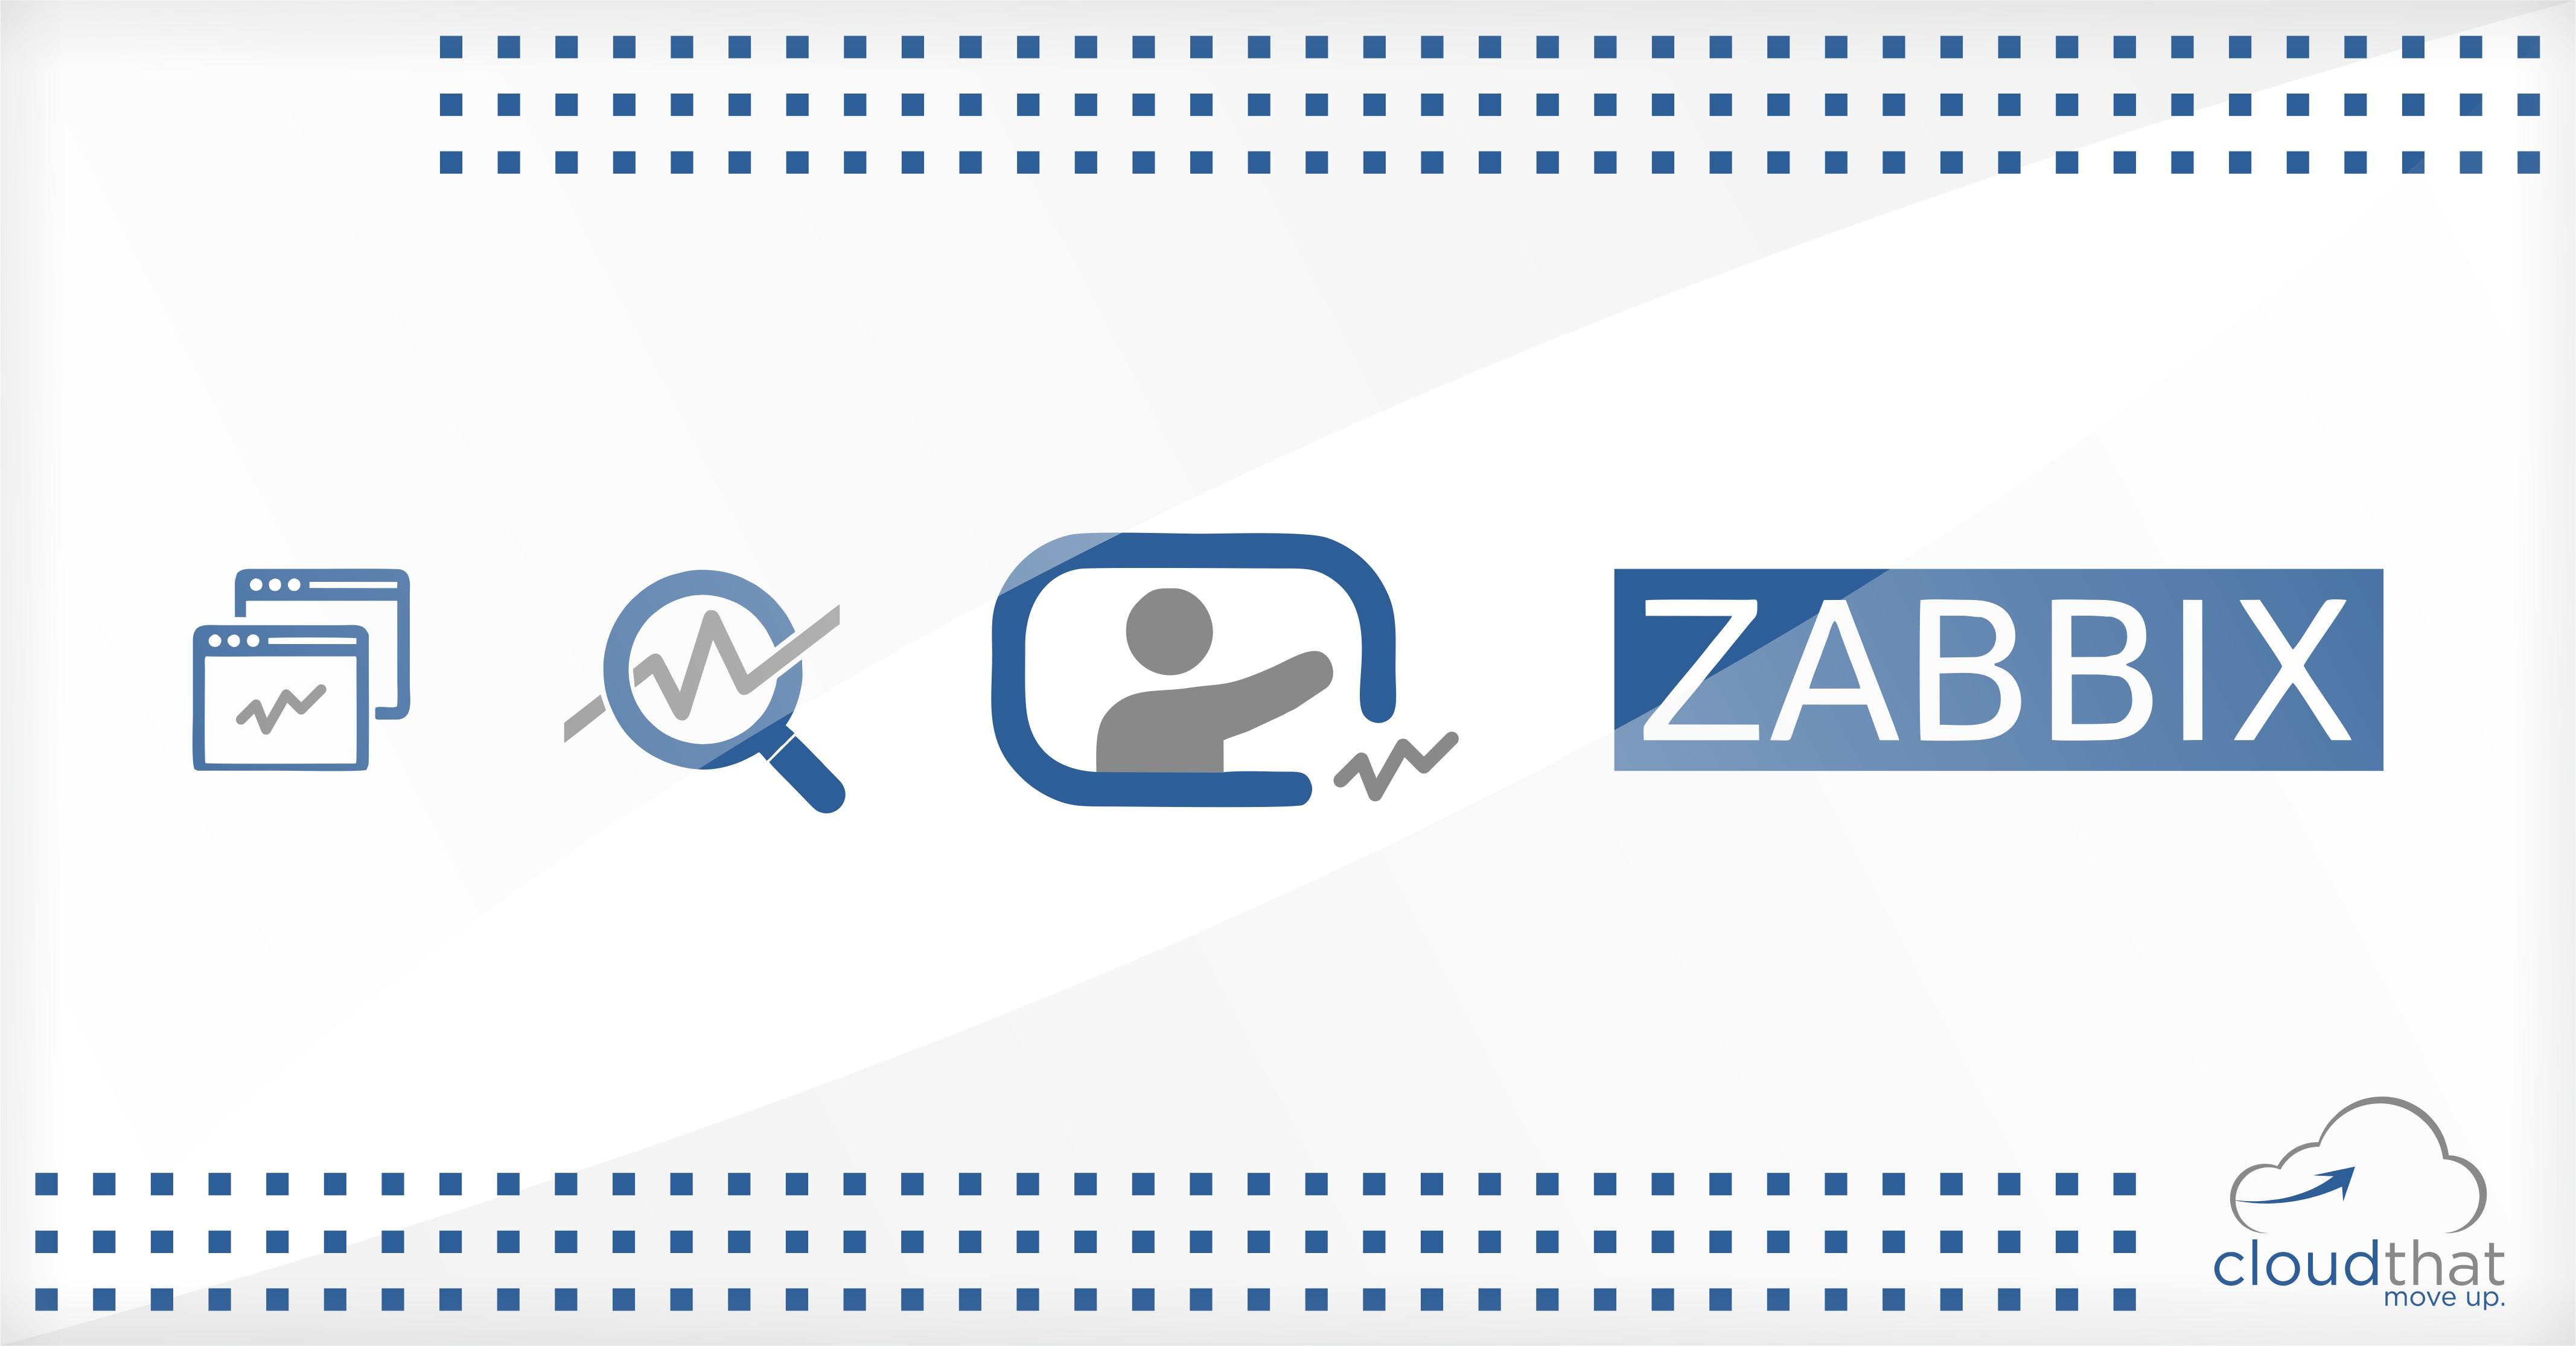 Zabbix- A Simpler way of Monitoring | CloudThat's Blog